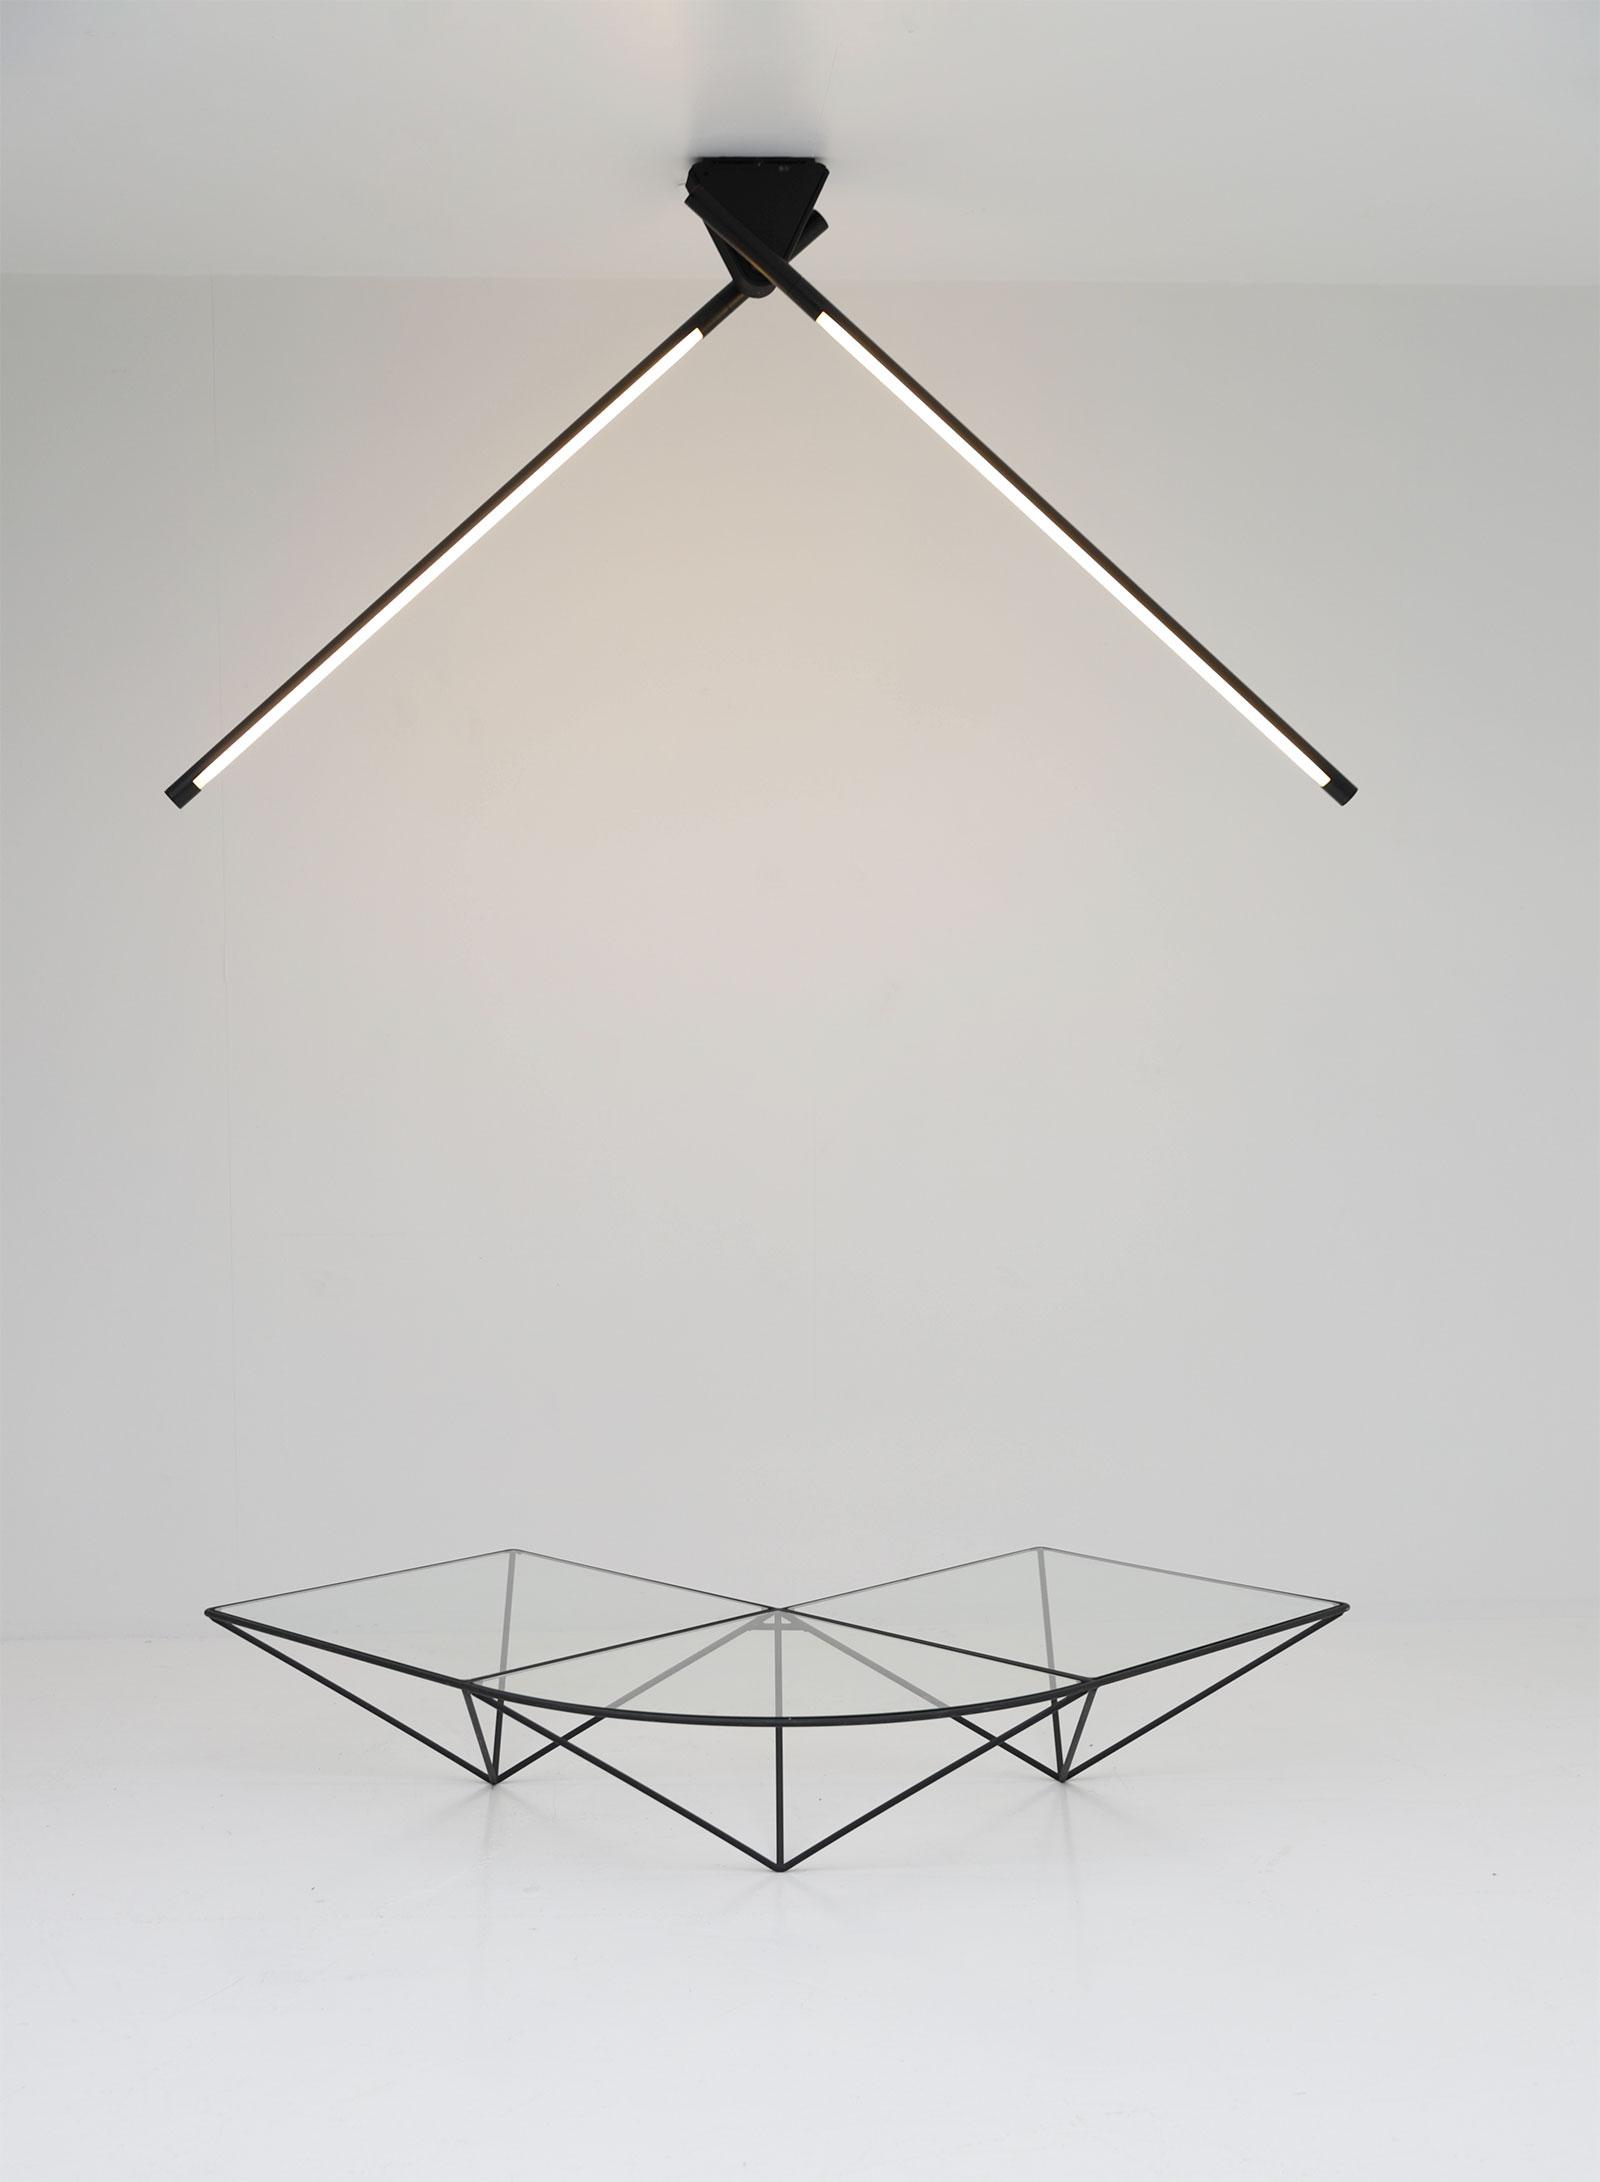 Rodolfo Bonetto Wall, Ceiling or Floor lampimage 10